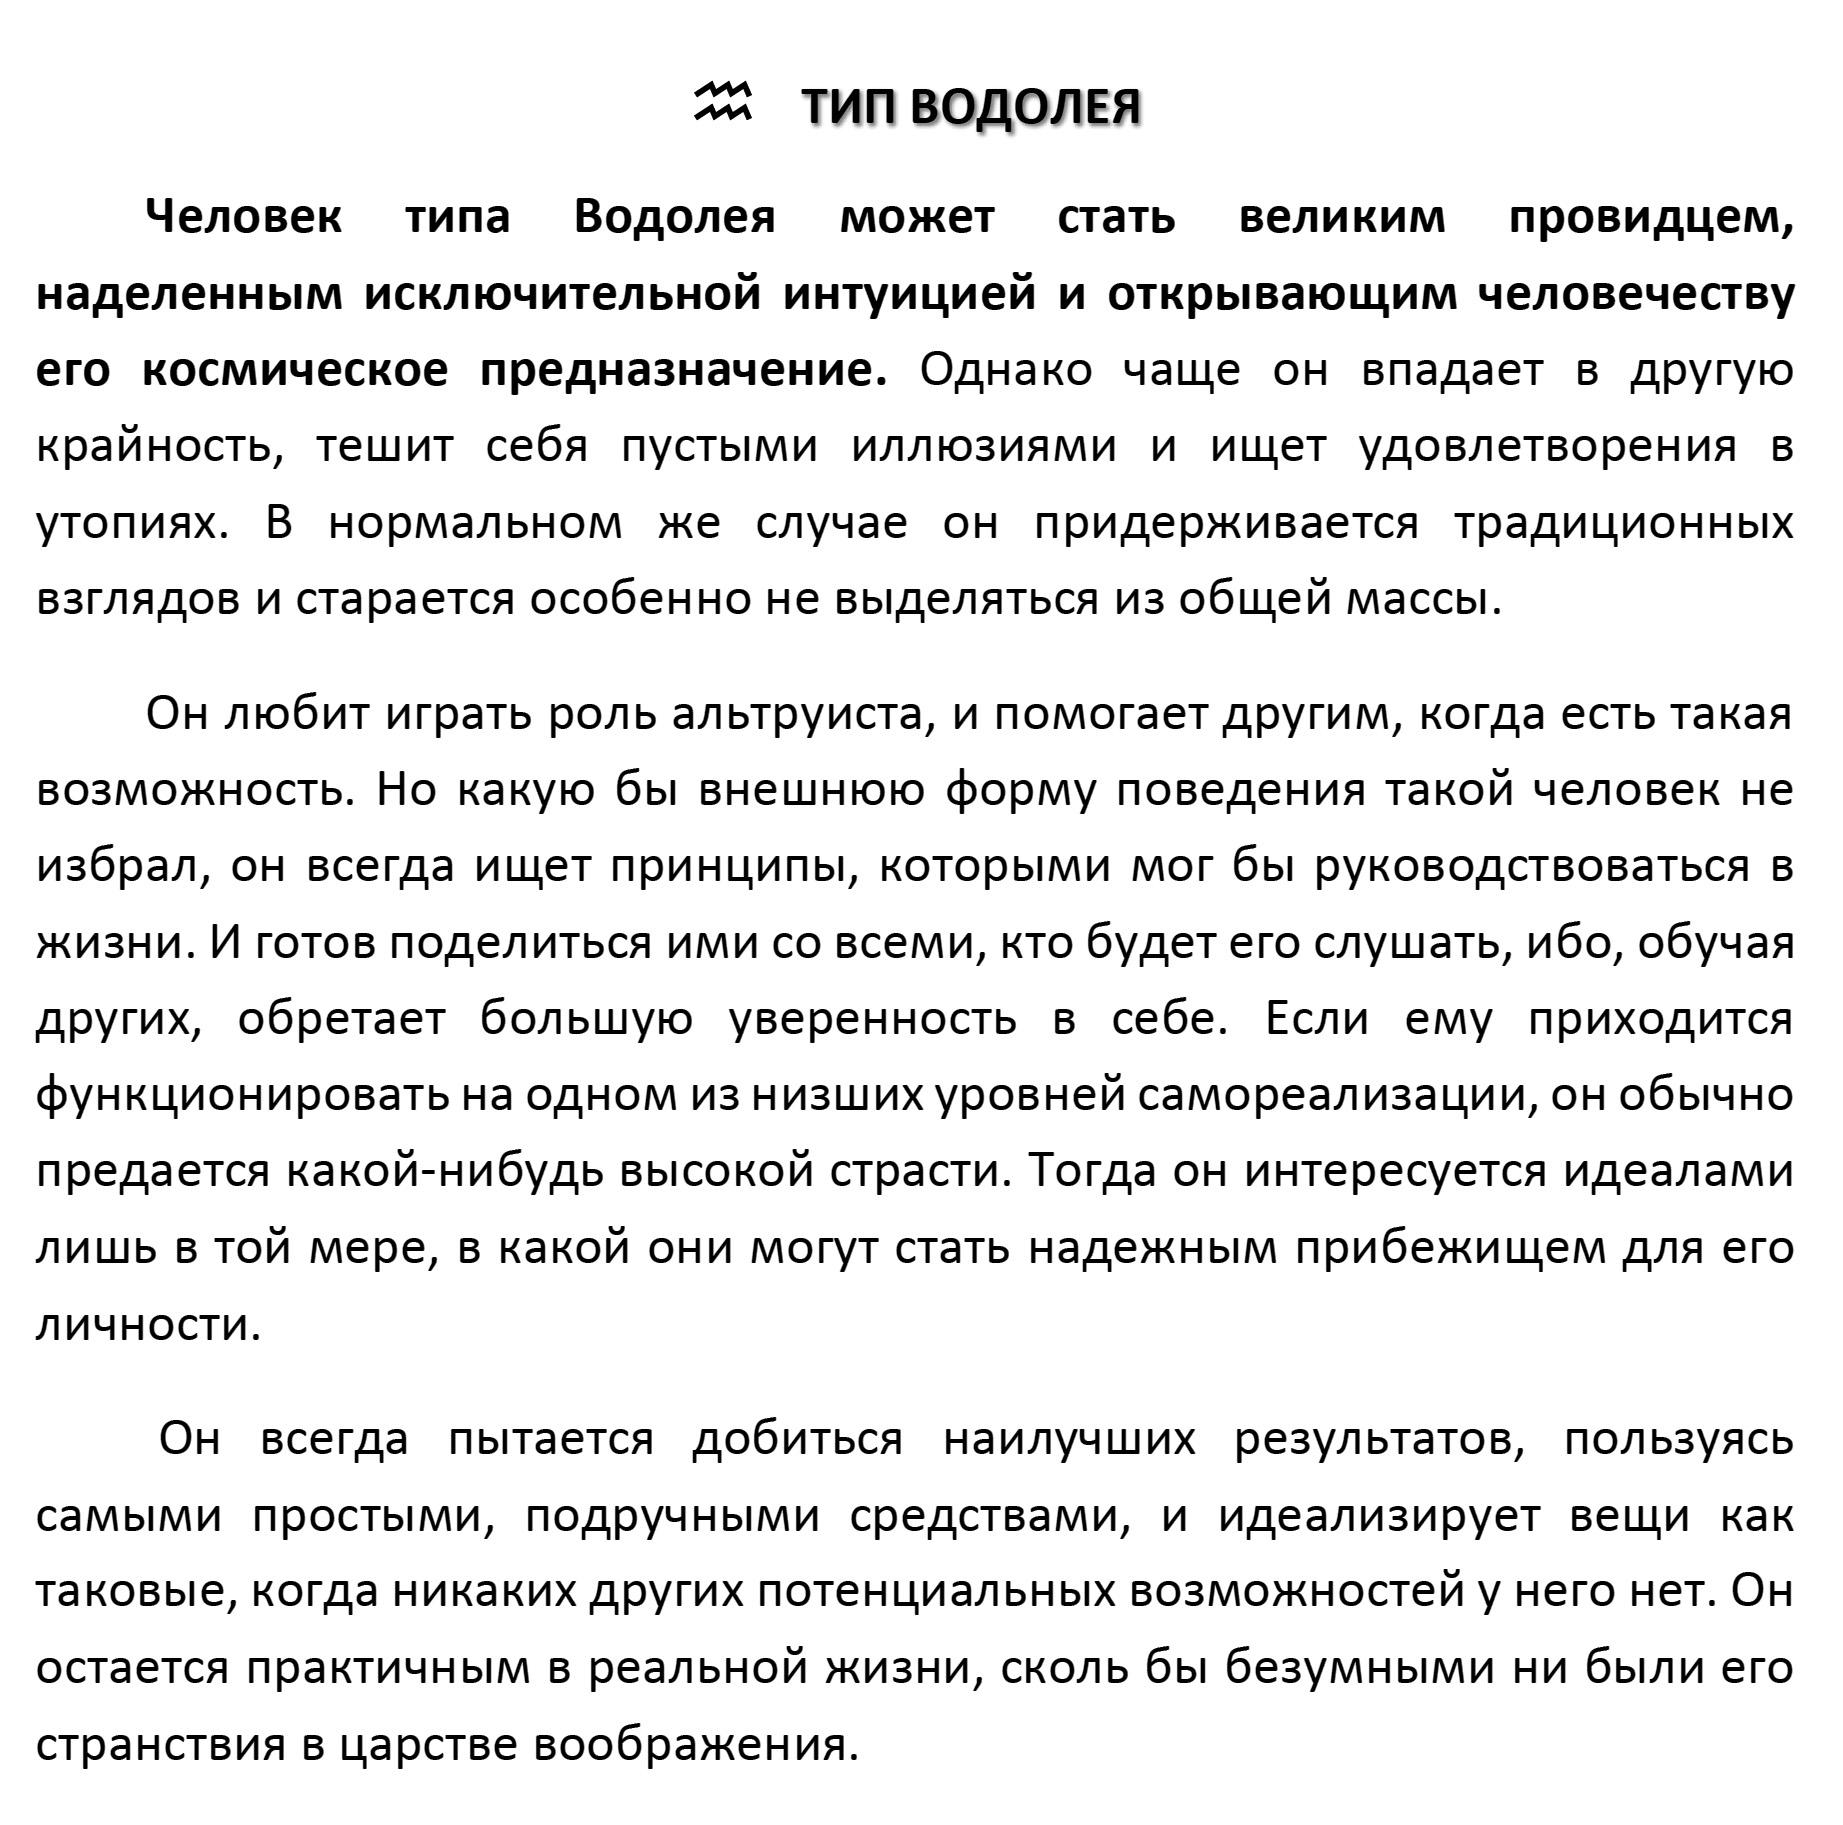 11-tip-vodoleya